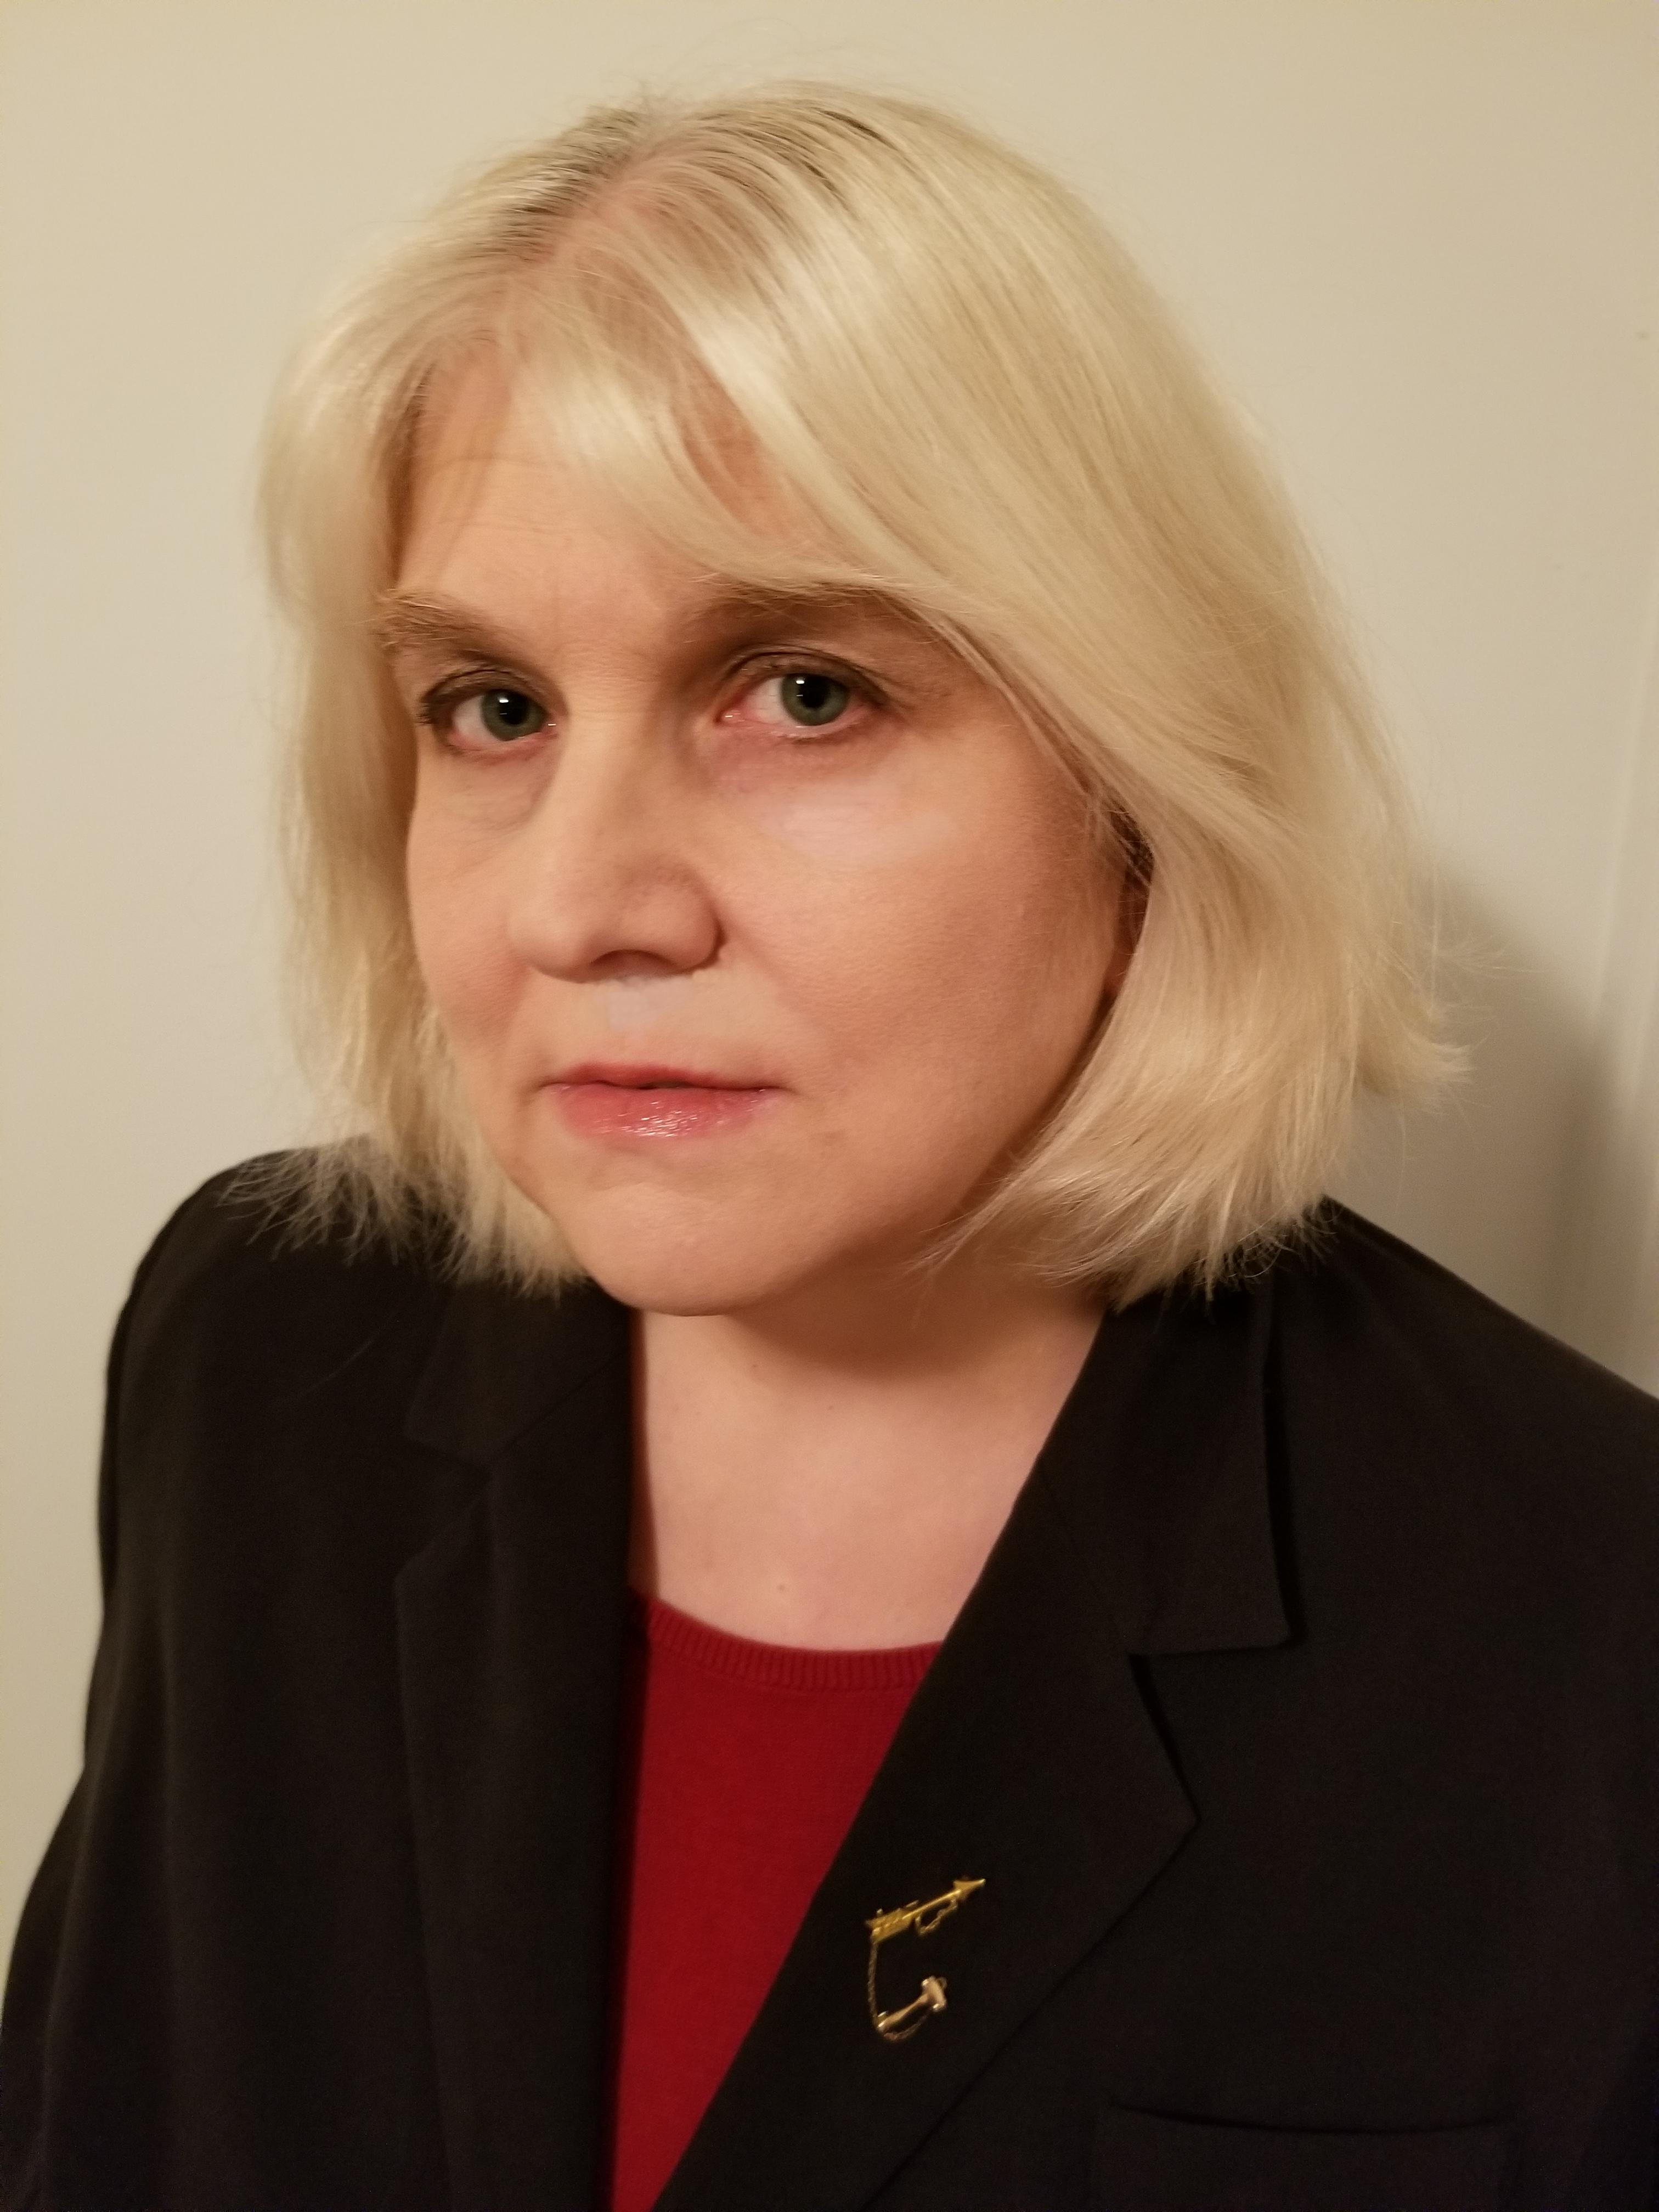 about Janet Gershen-Siegel